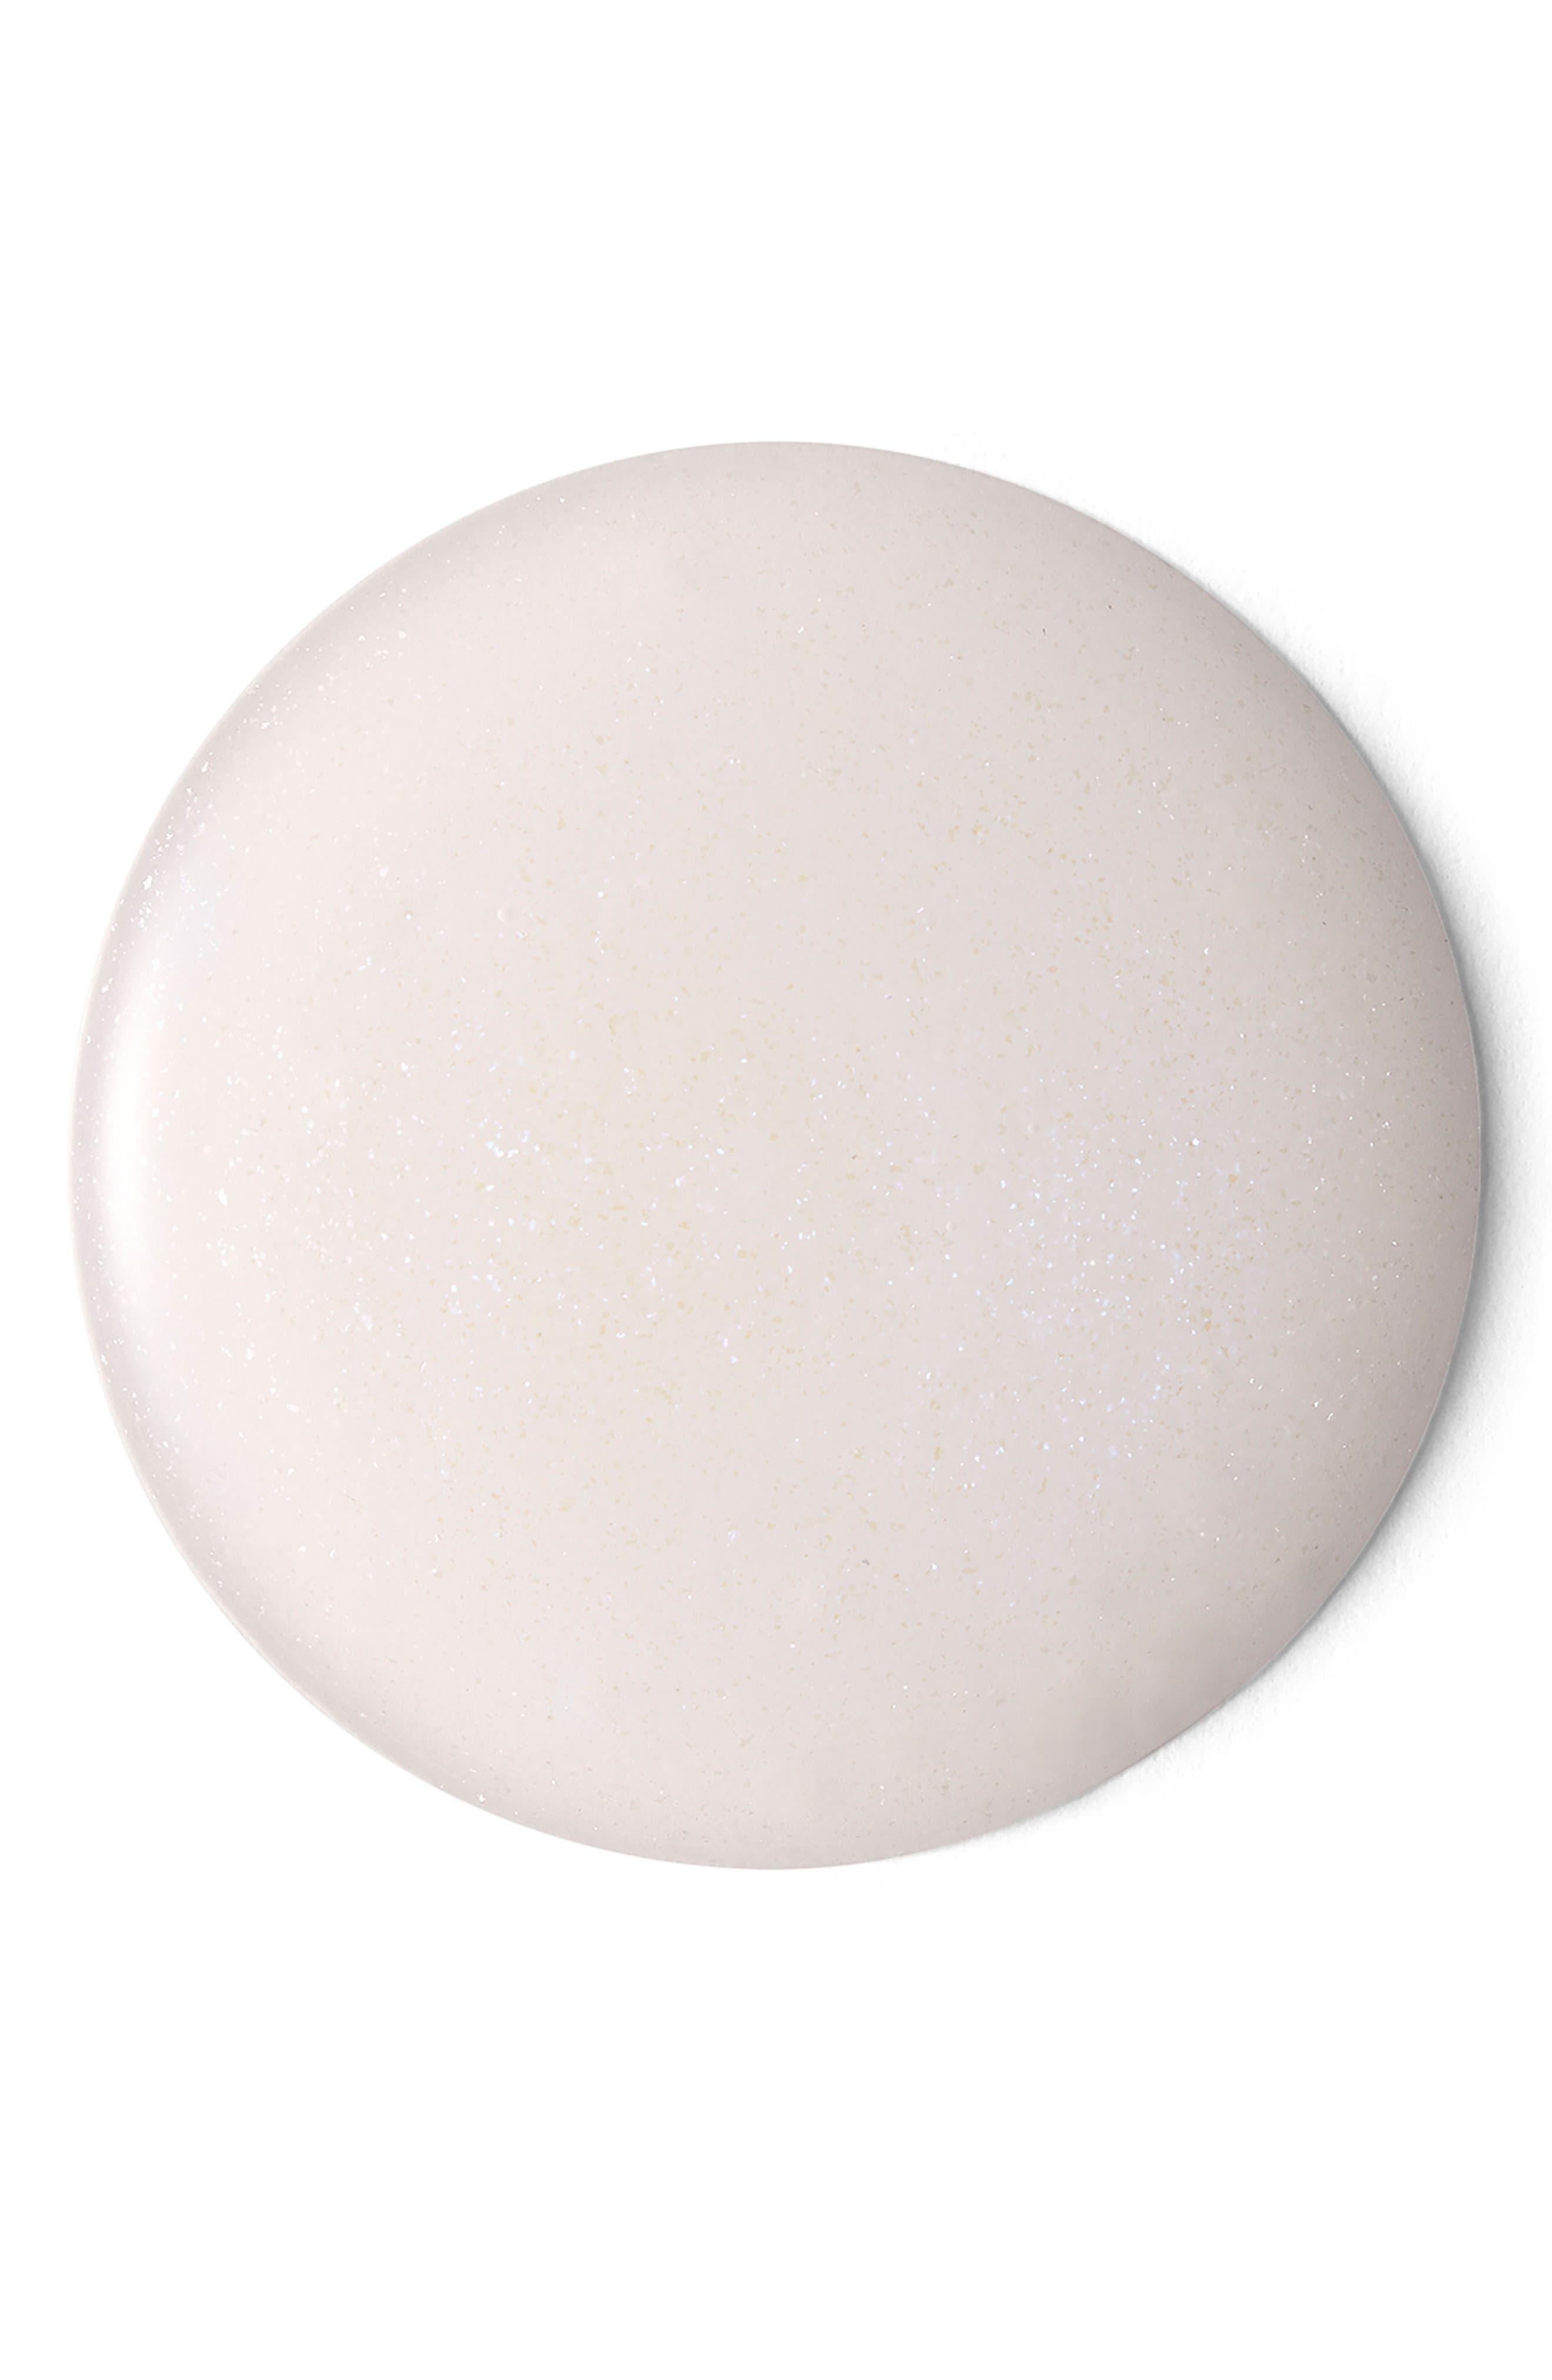 Alternate Image 3  - La Prairie 'White Caviar' Illuminating Eye Serum